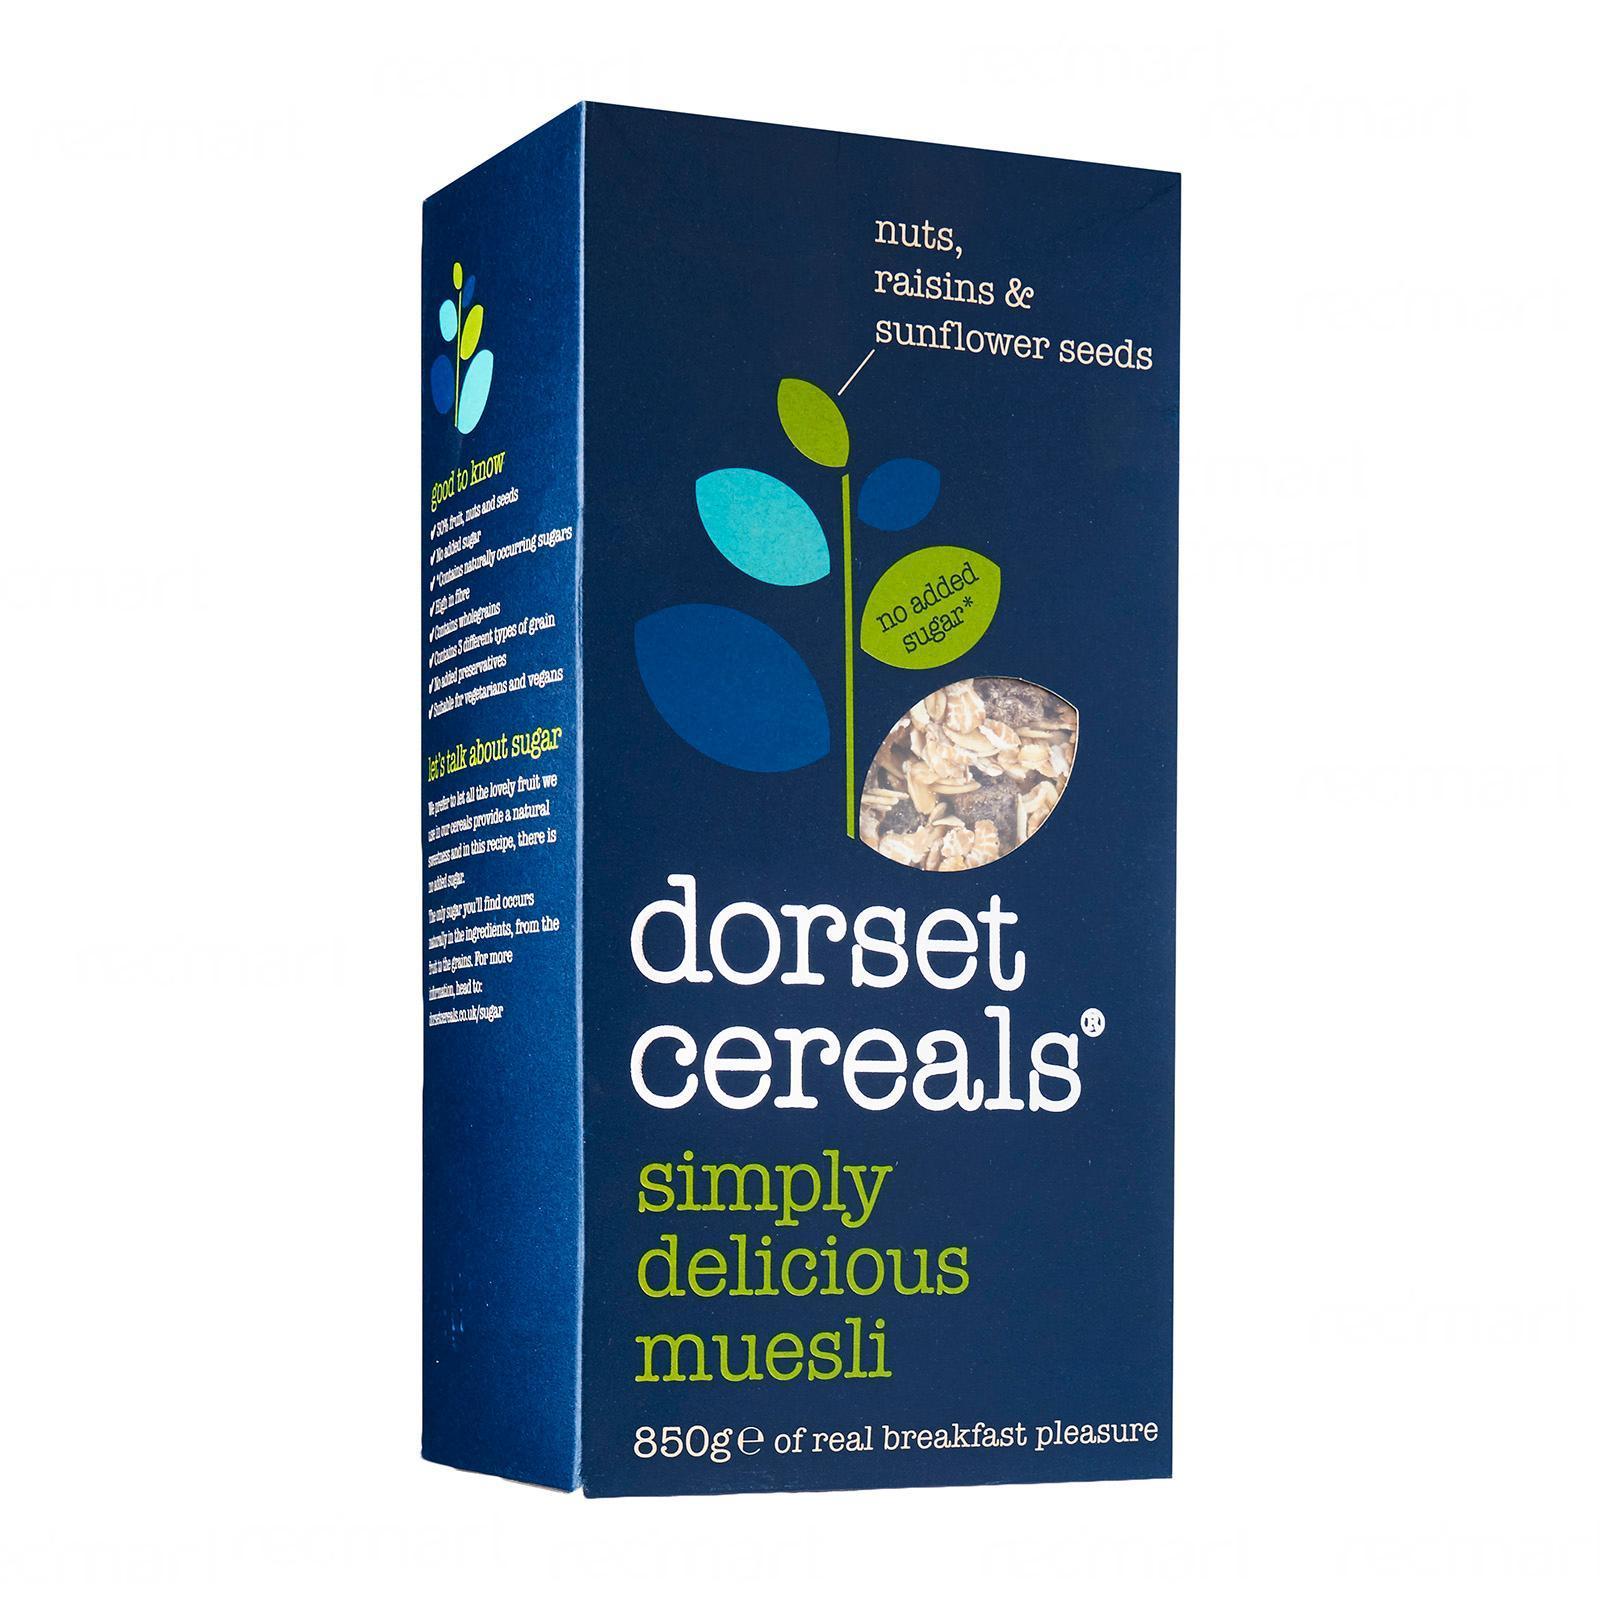 Dorset Cereals Simply Delicious Muesli By Redmart.